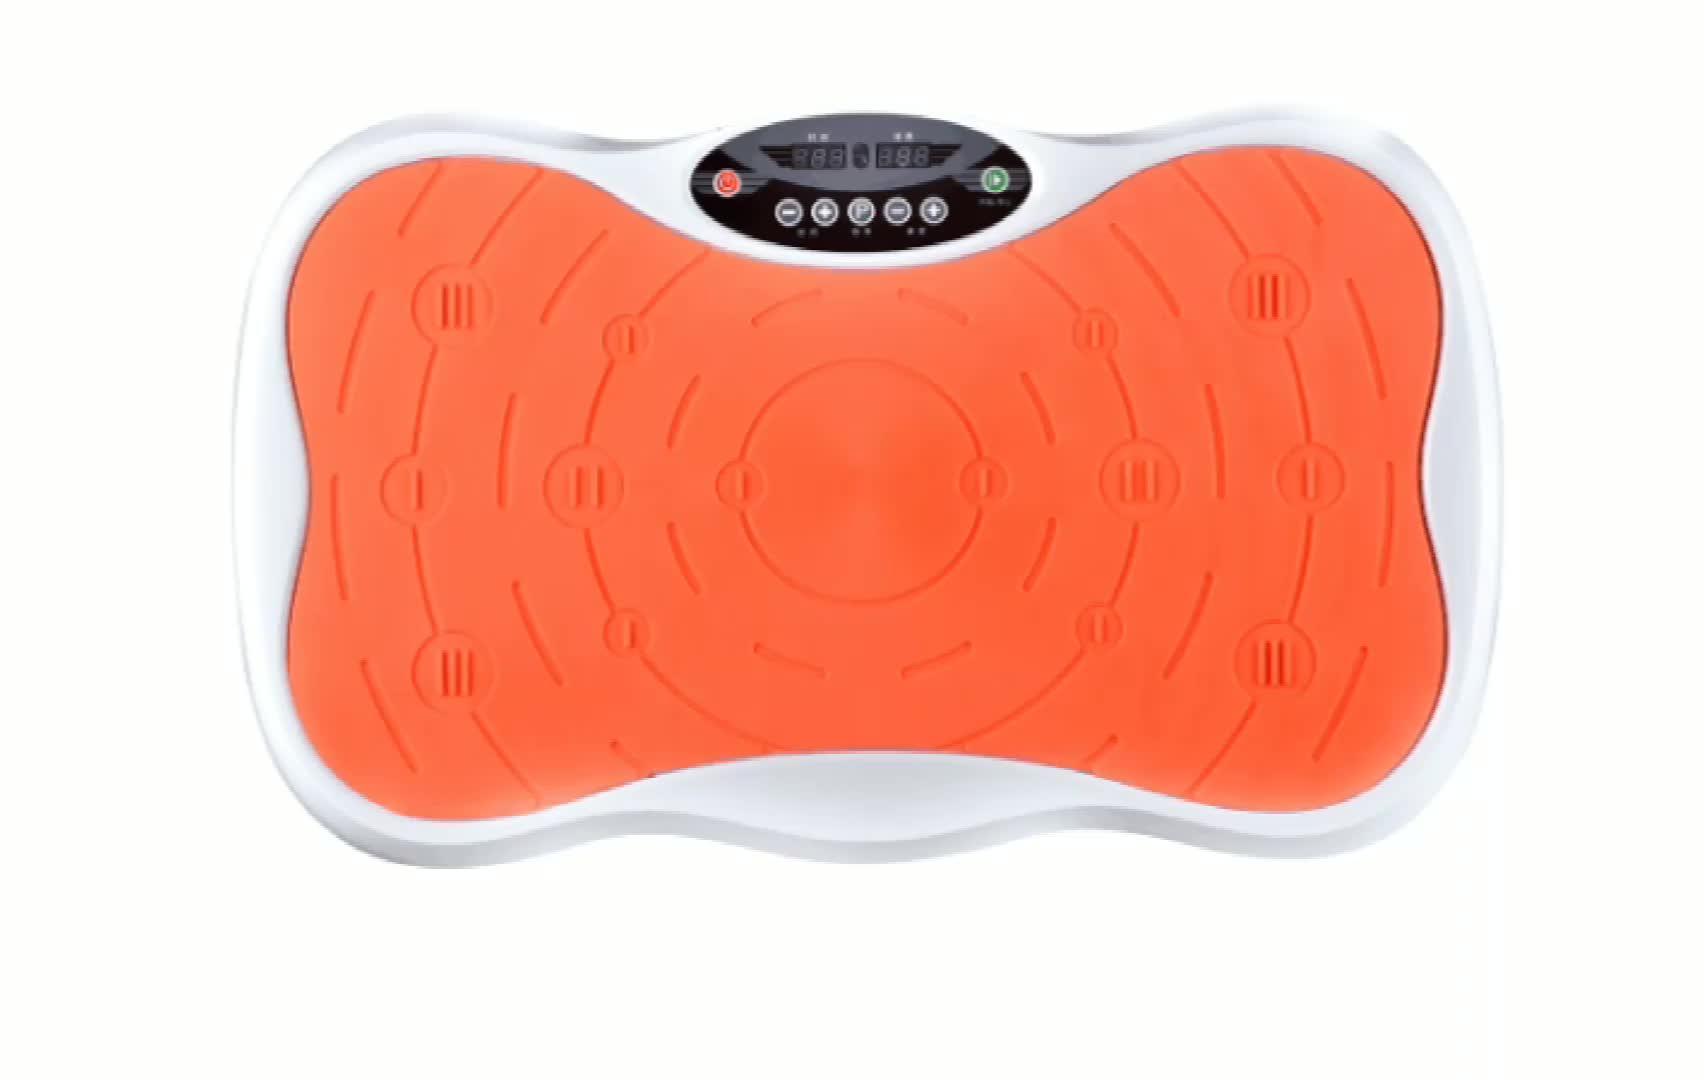 Fitness whole body workout exercise machine small mini ultrathin vibration plate gym fitness equipment whole body Vibration